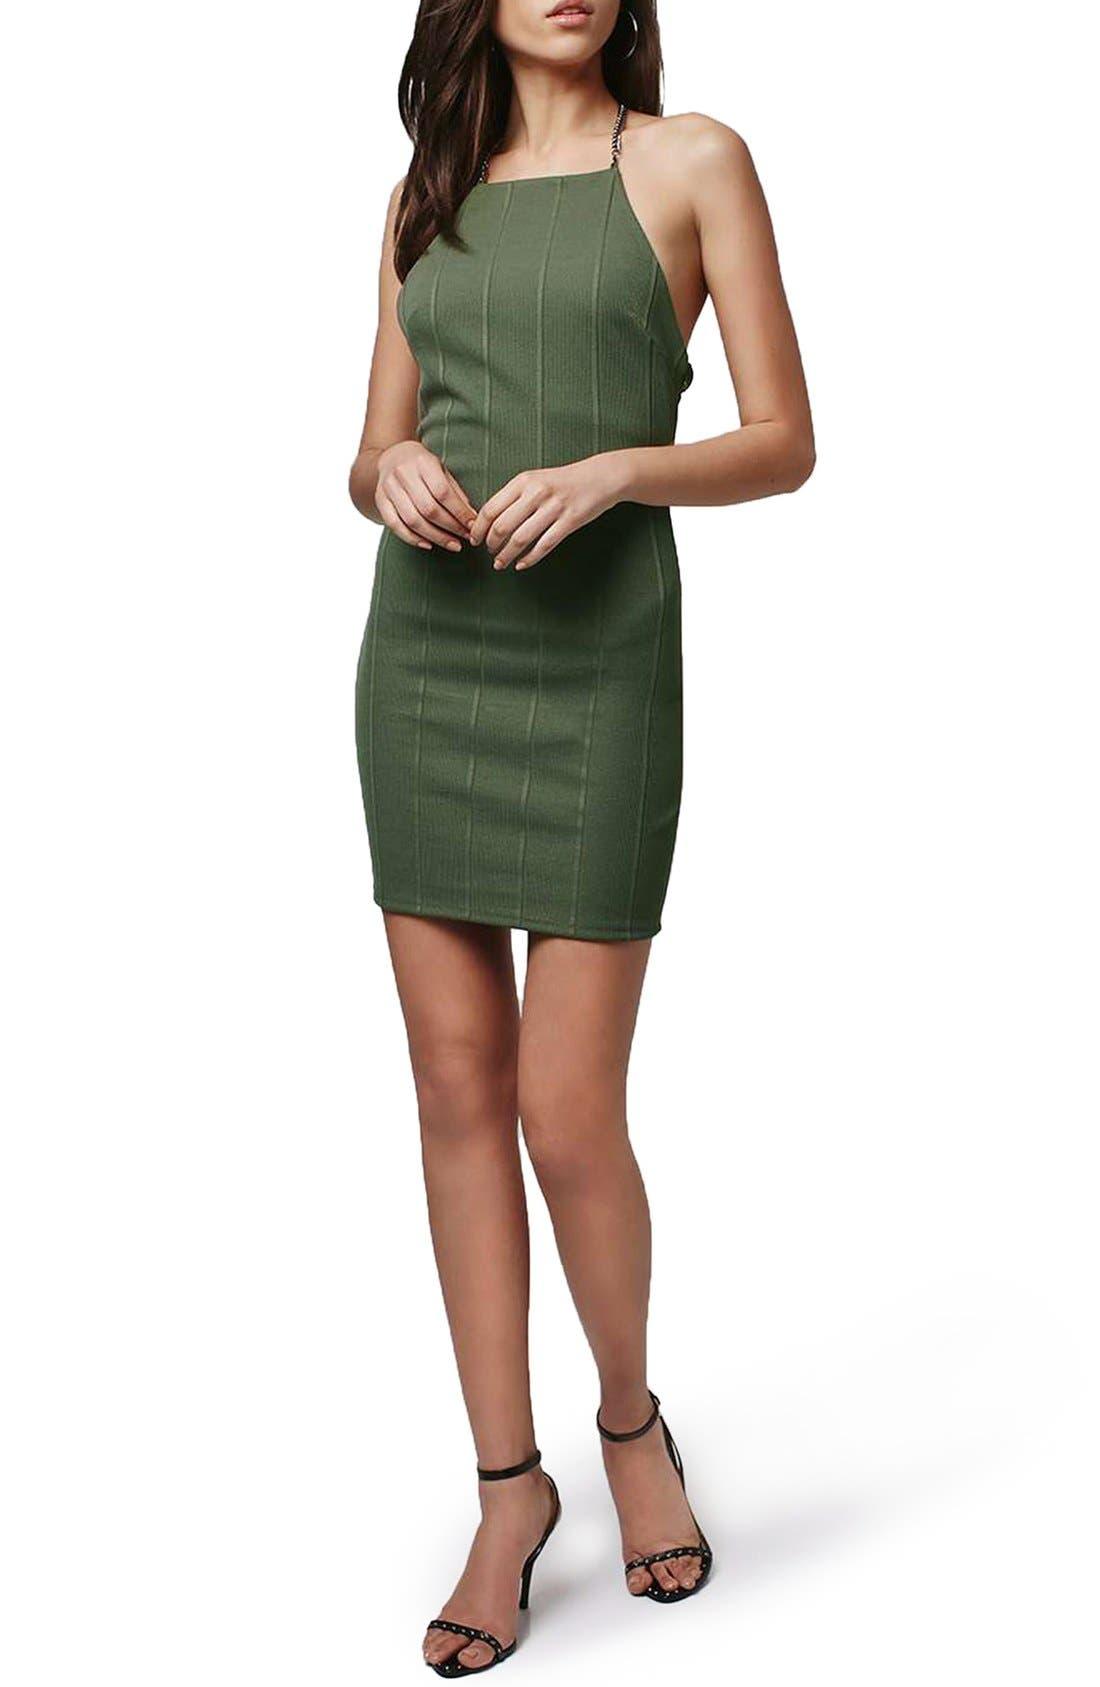 Alternate Image 1 Selected - Topshop Chain Strap Bandage Body-Con Dress (Regular & Petite)